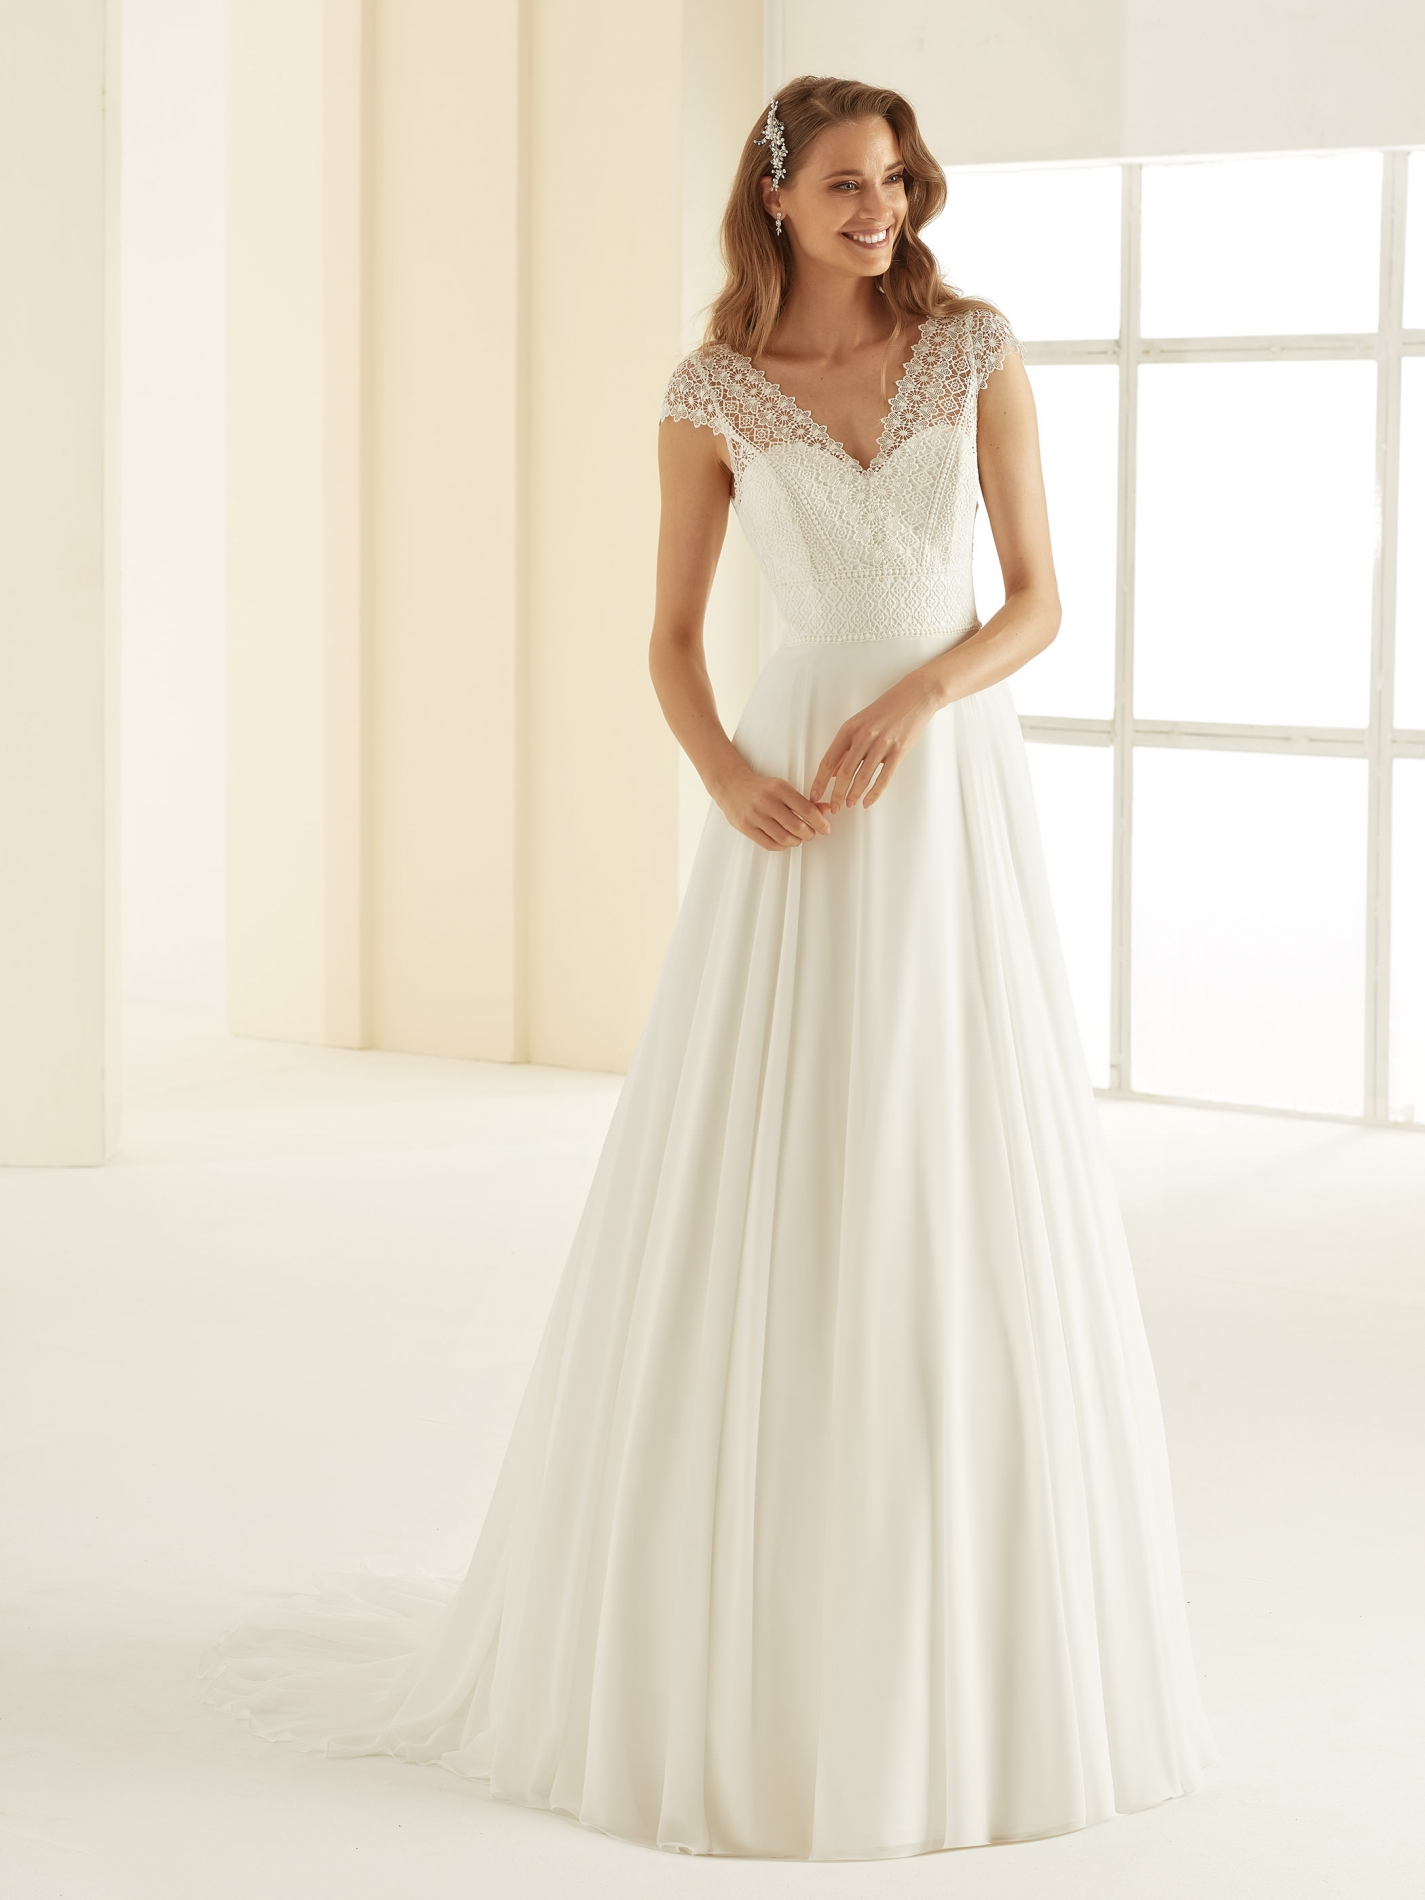 MARGARET-Bianco-Evento-bridal-dress-(1)